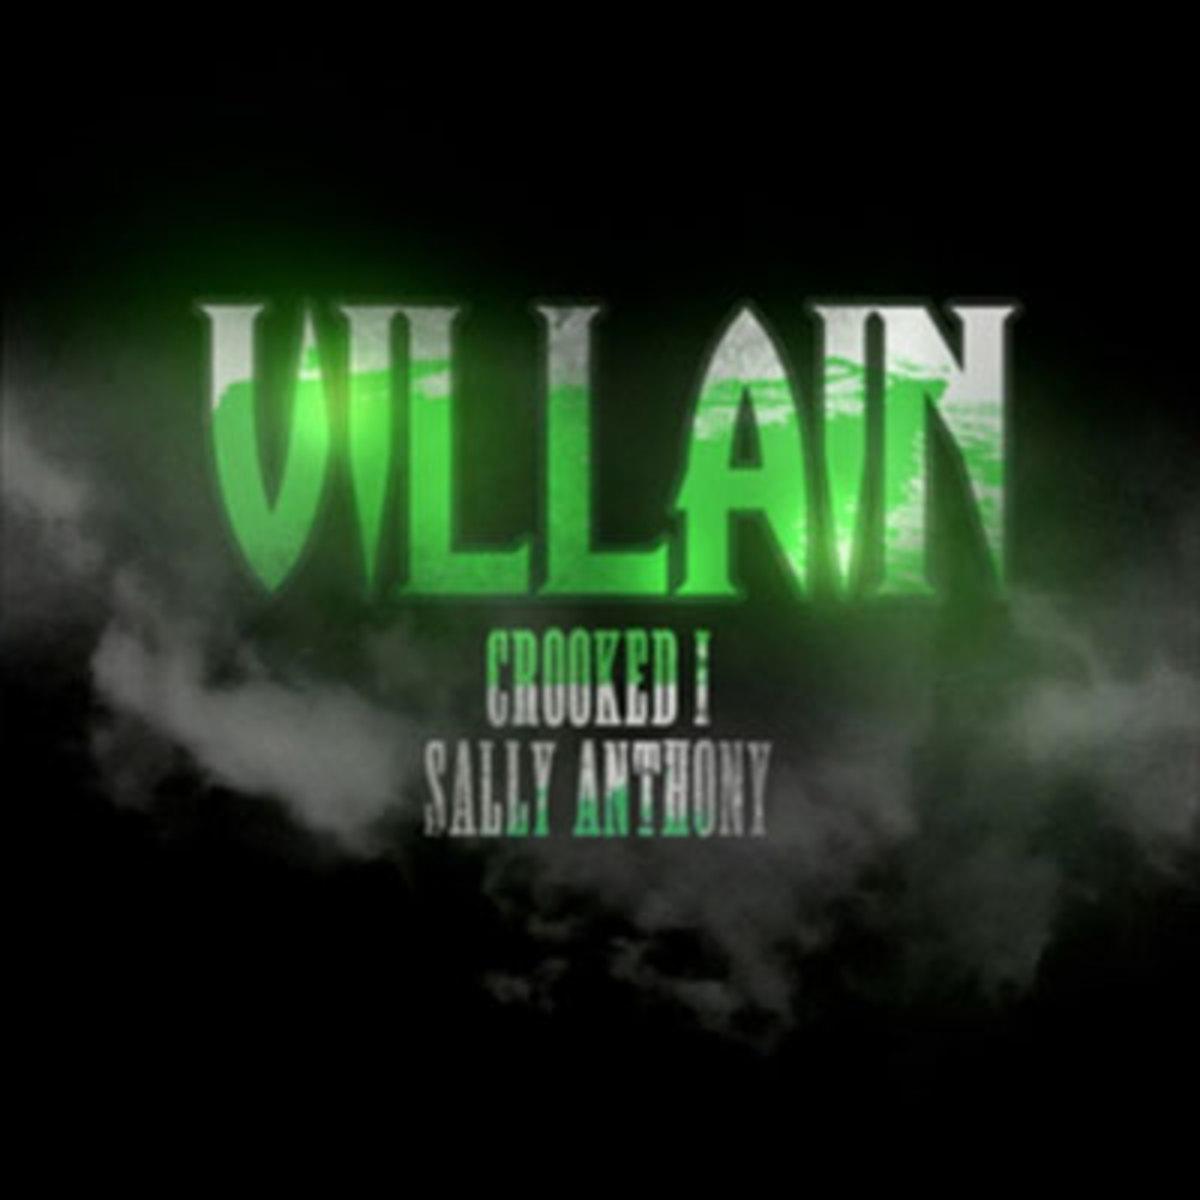 crookedi-villain.jpg